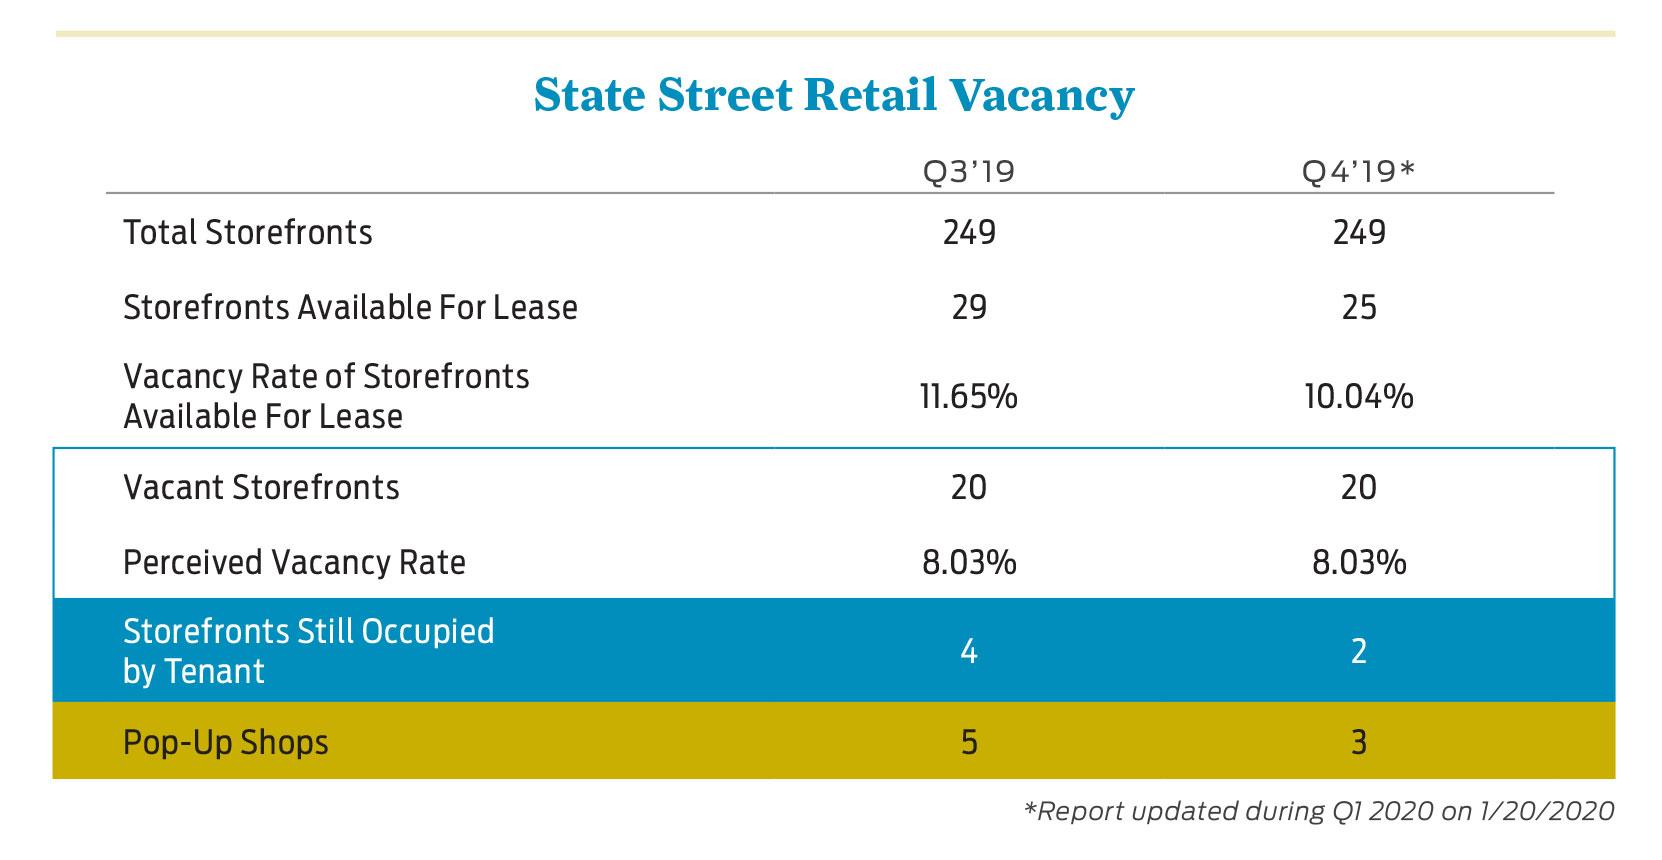 2019 State Street Retail Vacancy Chart